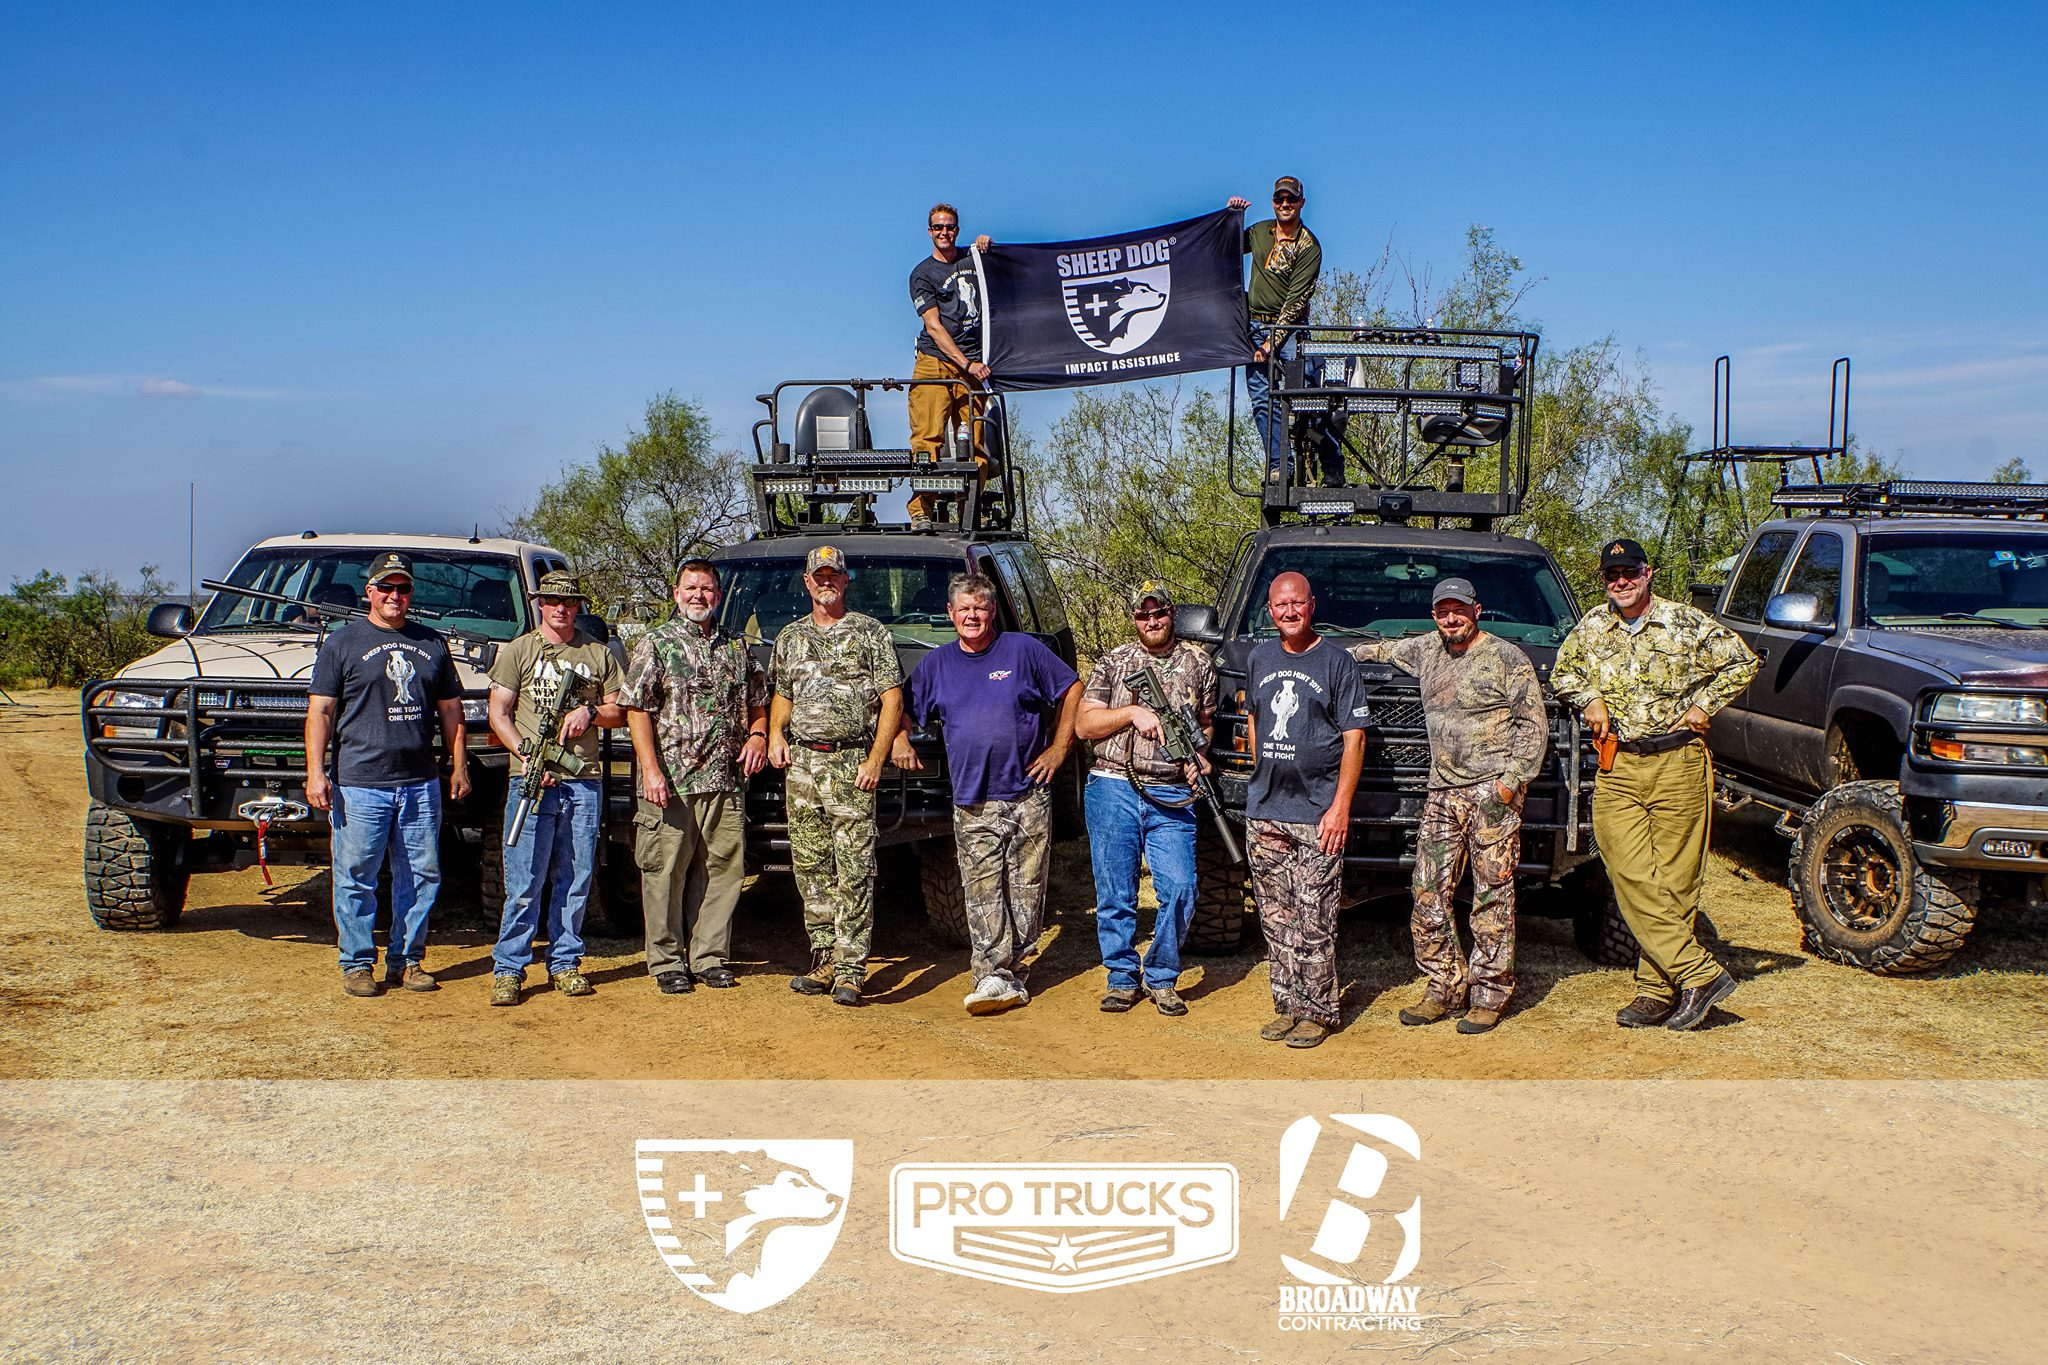 SDIA Fall 2015 Hunt group